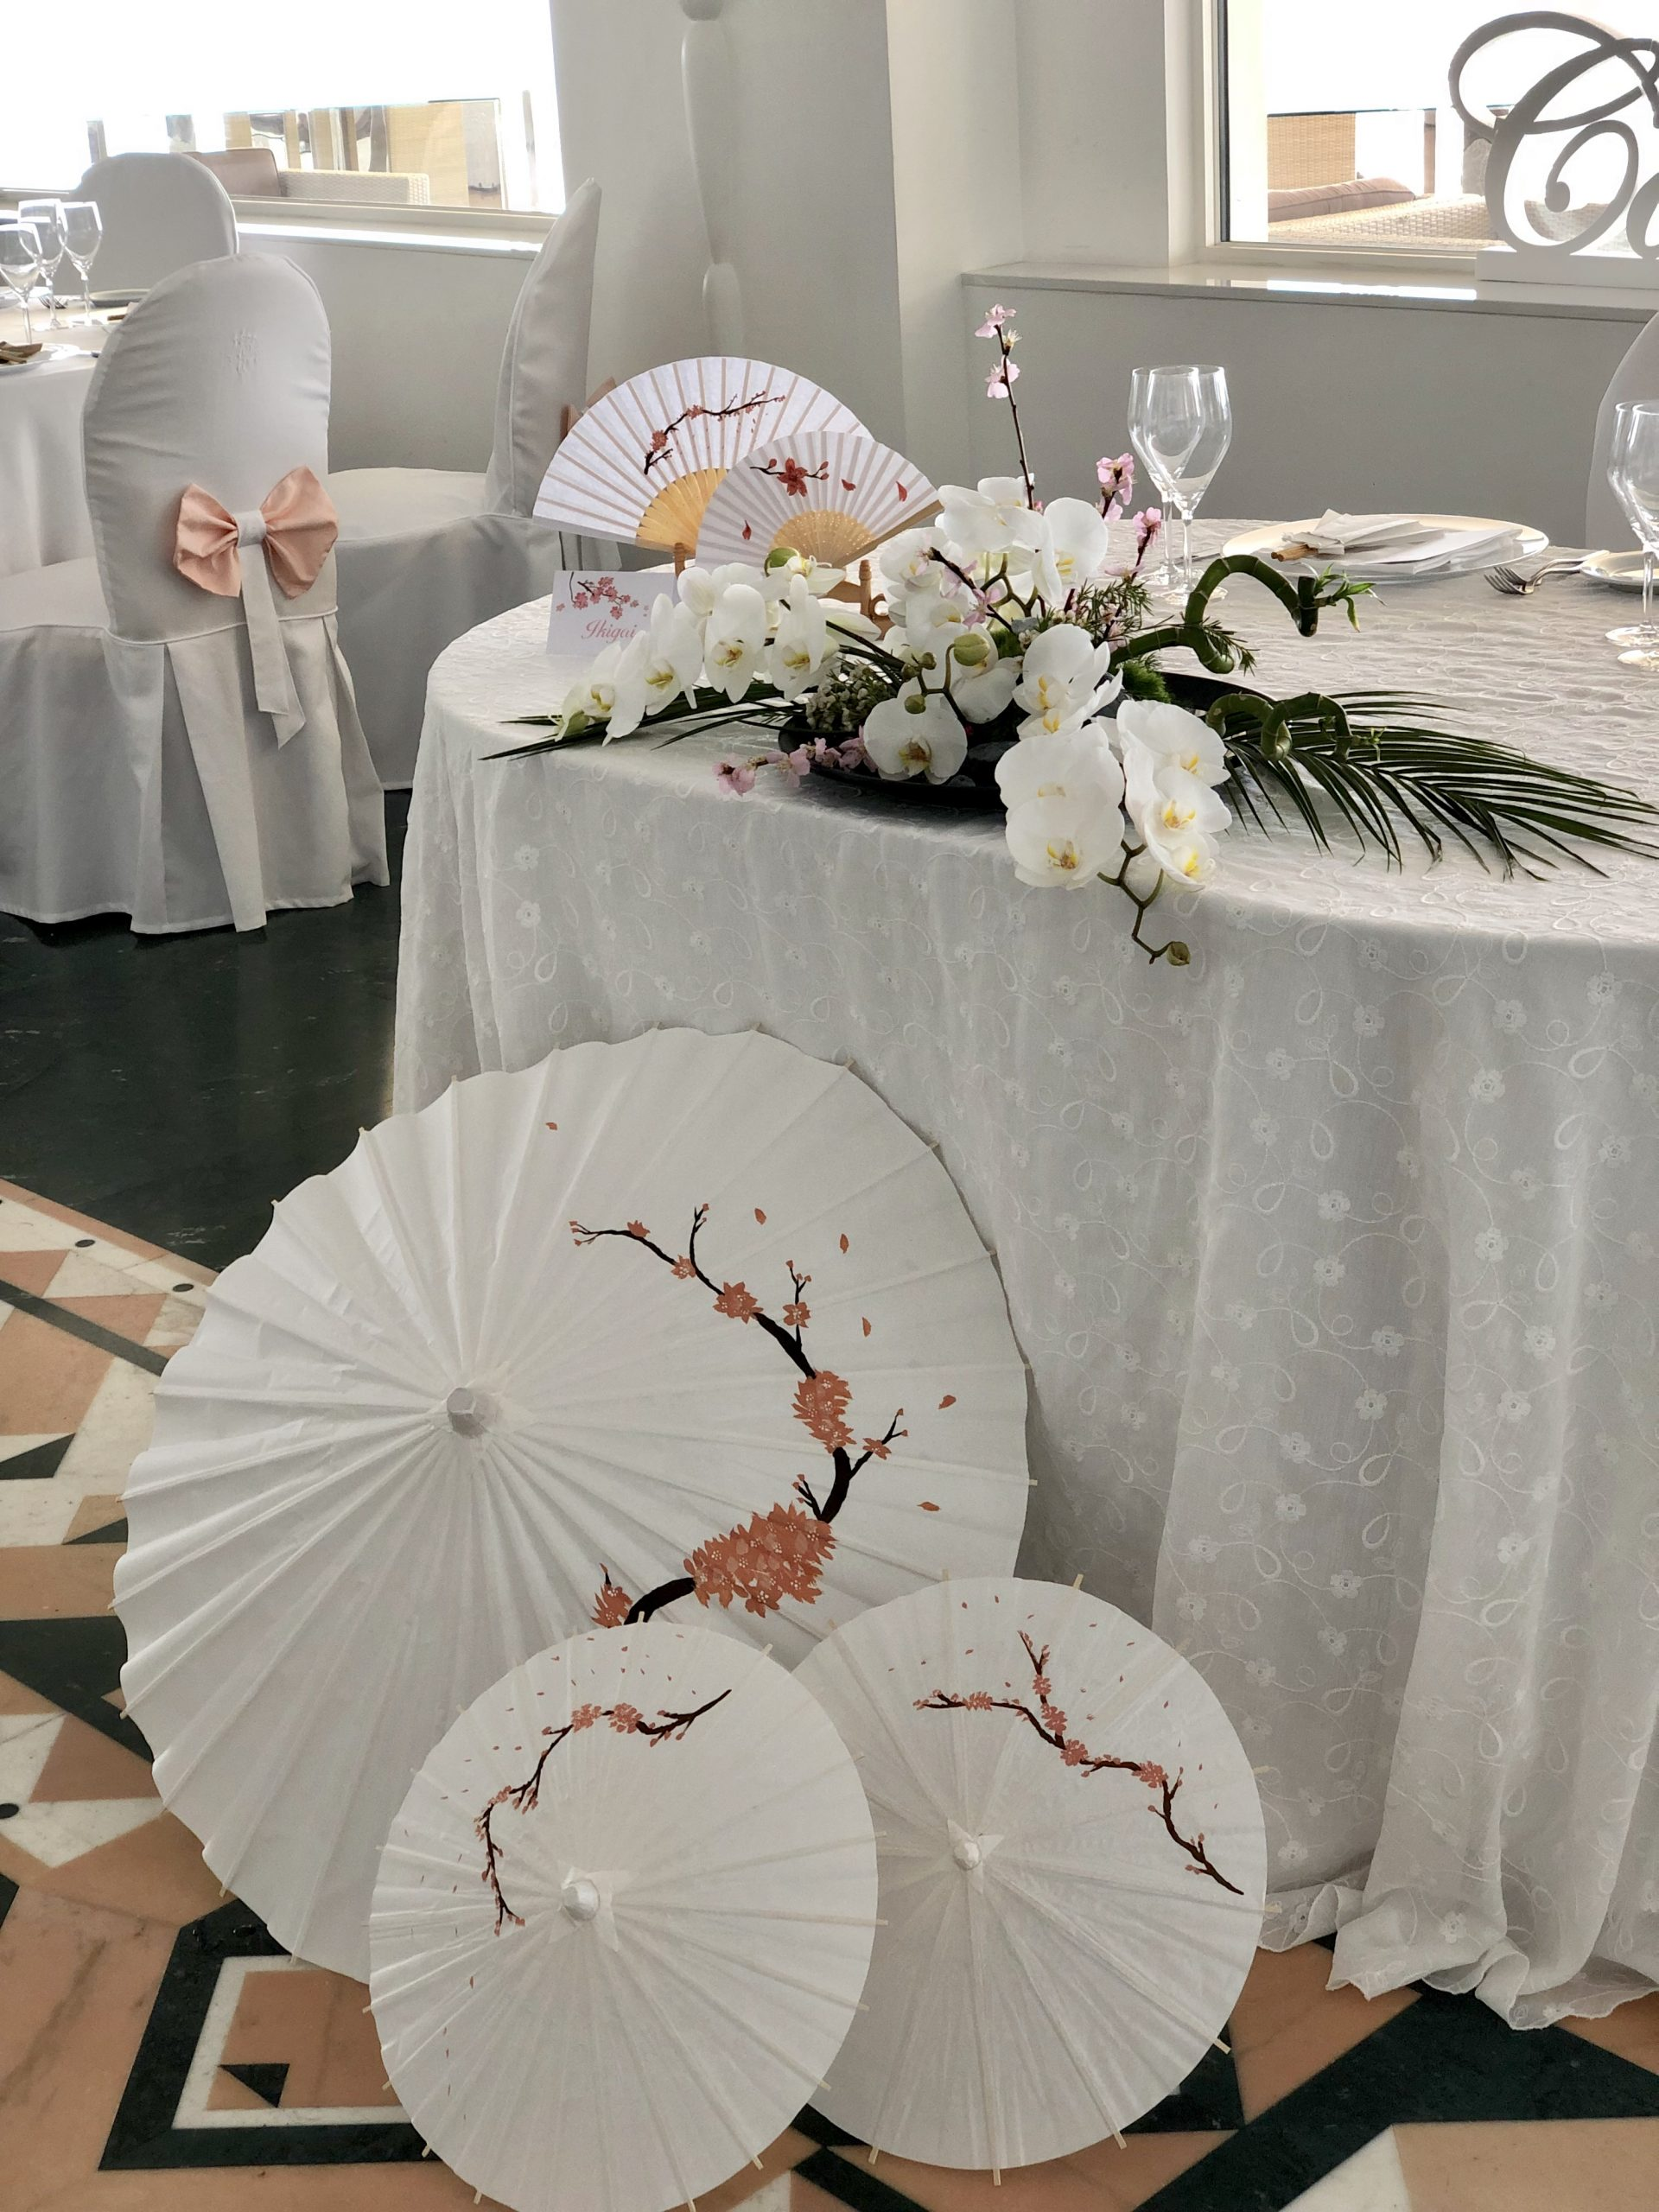 Allestimenti matrimonio Tema Giappone Garofalo Creazioni